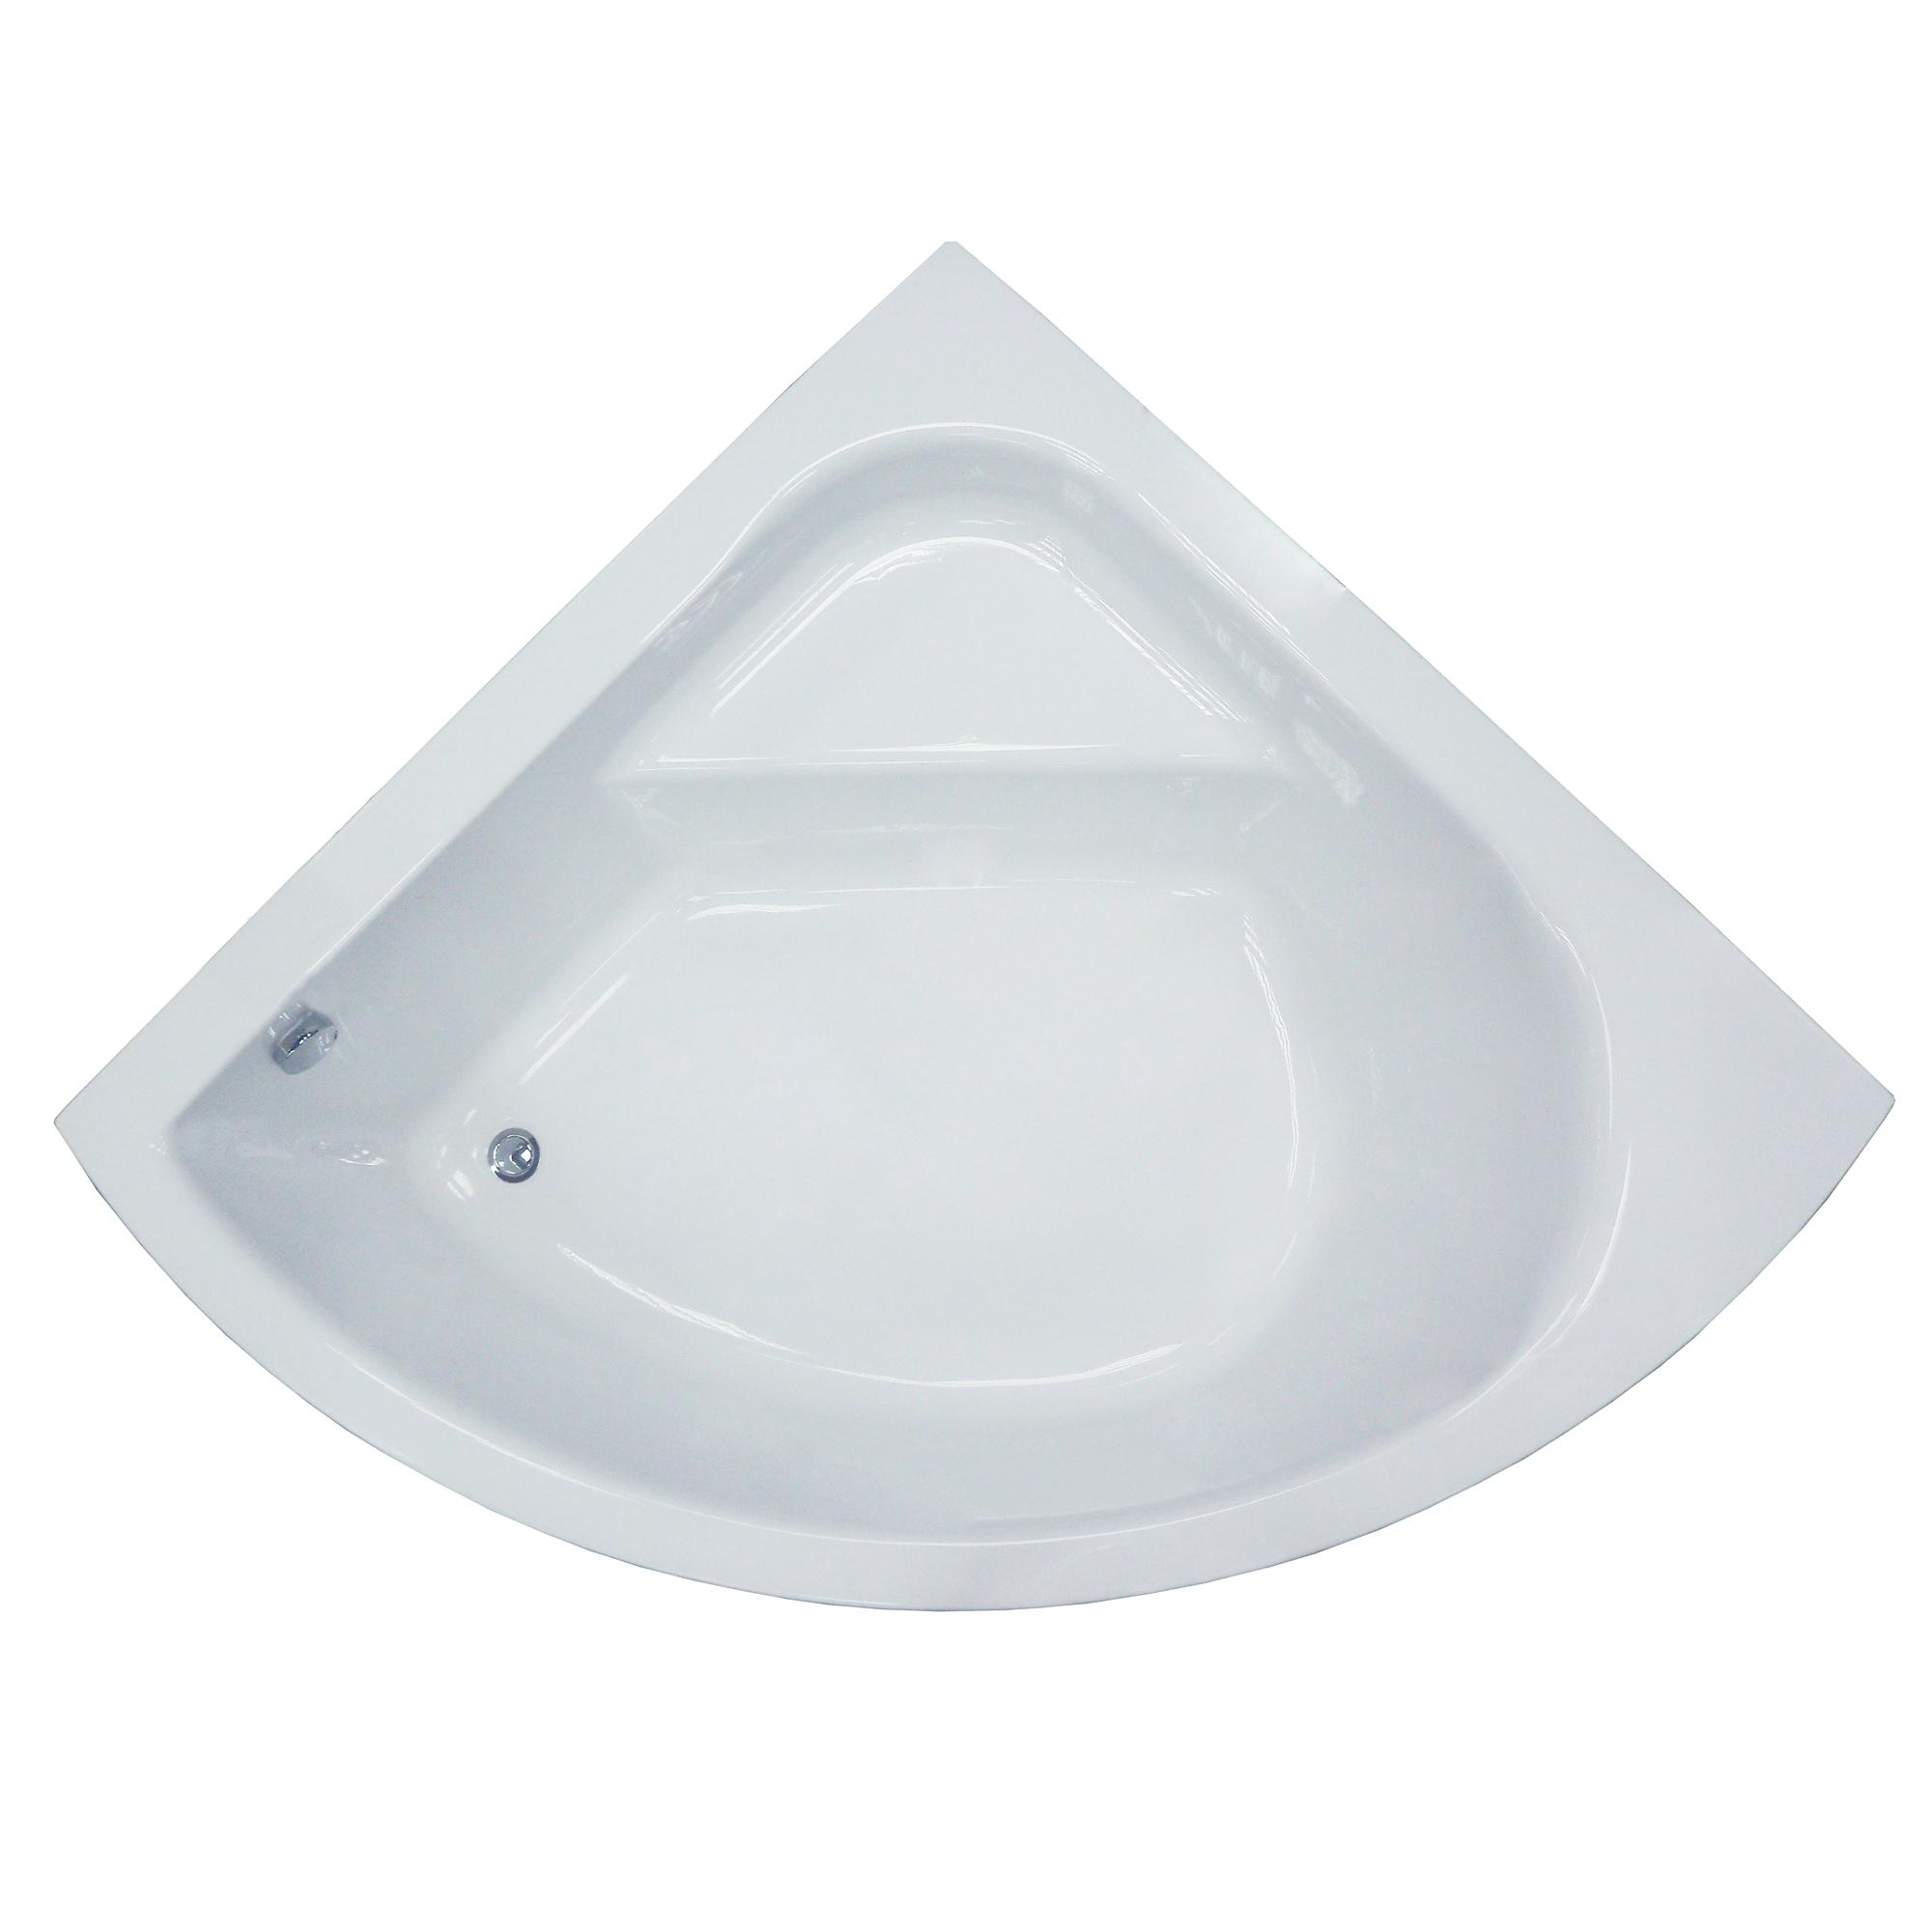 Акриловая ванна Royal bath Rojo RB375201 150х150 каркас сварной к ванне royal bath vienna 150 rb953201k